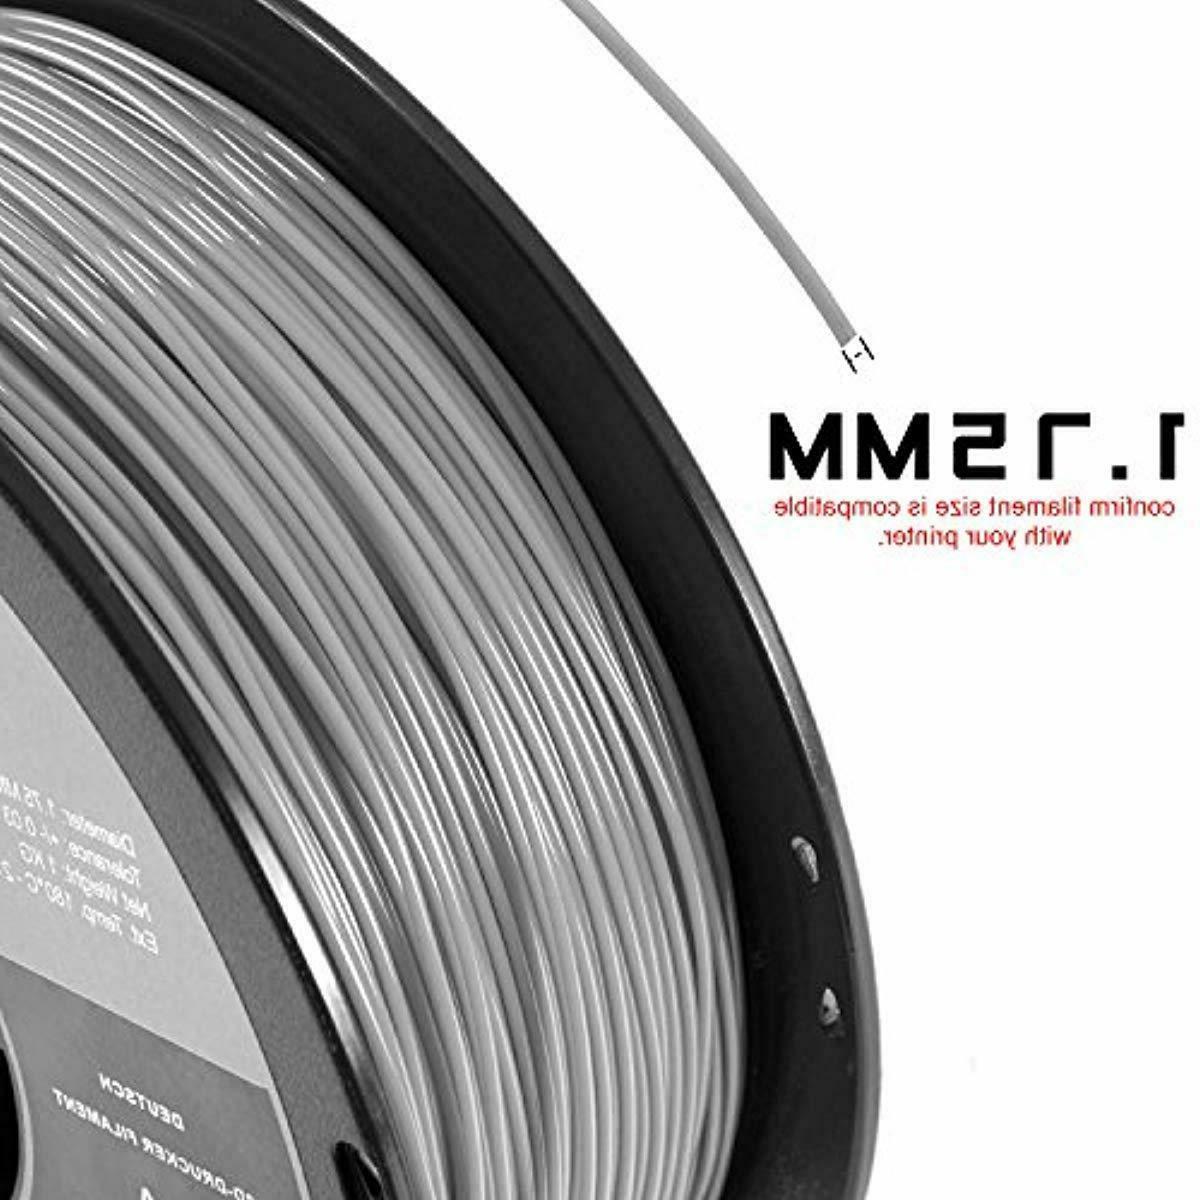 HATCHBOX PLA Filament, Dimensional Accuracy 0.03 mm, Spool,